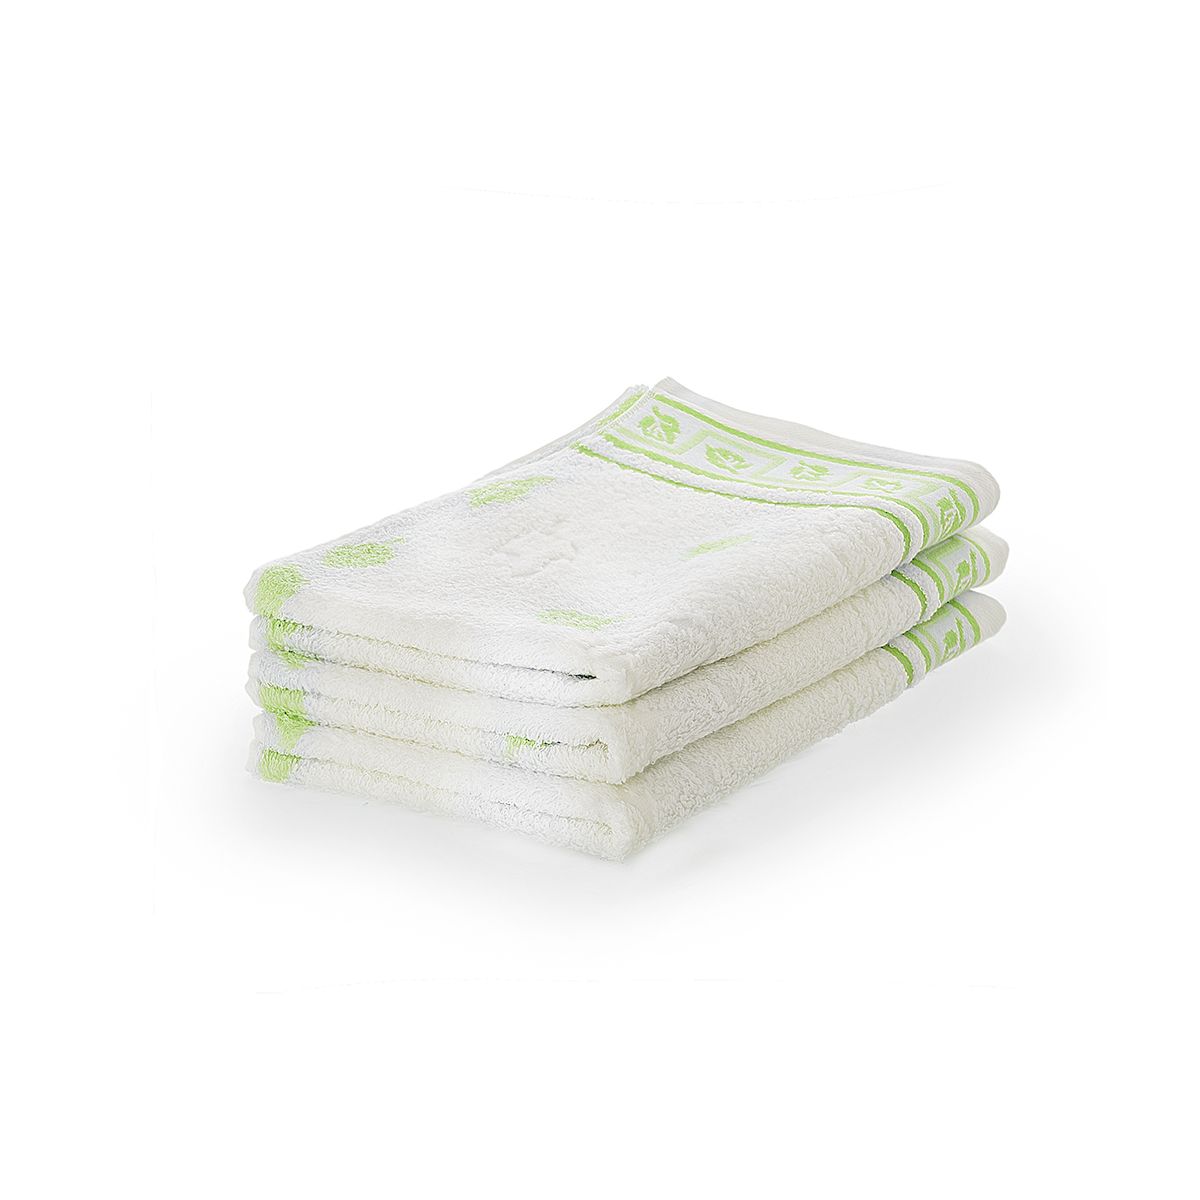 Полотенце Листопад Зеленый, размер 65х135 смПолотенца<br>Плотность ткани: 480 г/кв. м.<br><br>Тип: Полотенце<br>Размер: 65х135<br>Материал: Махра